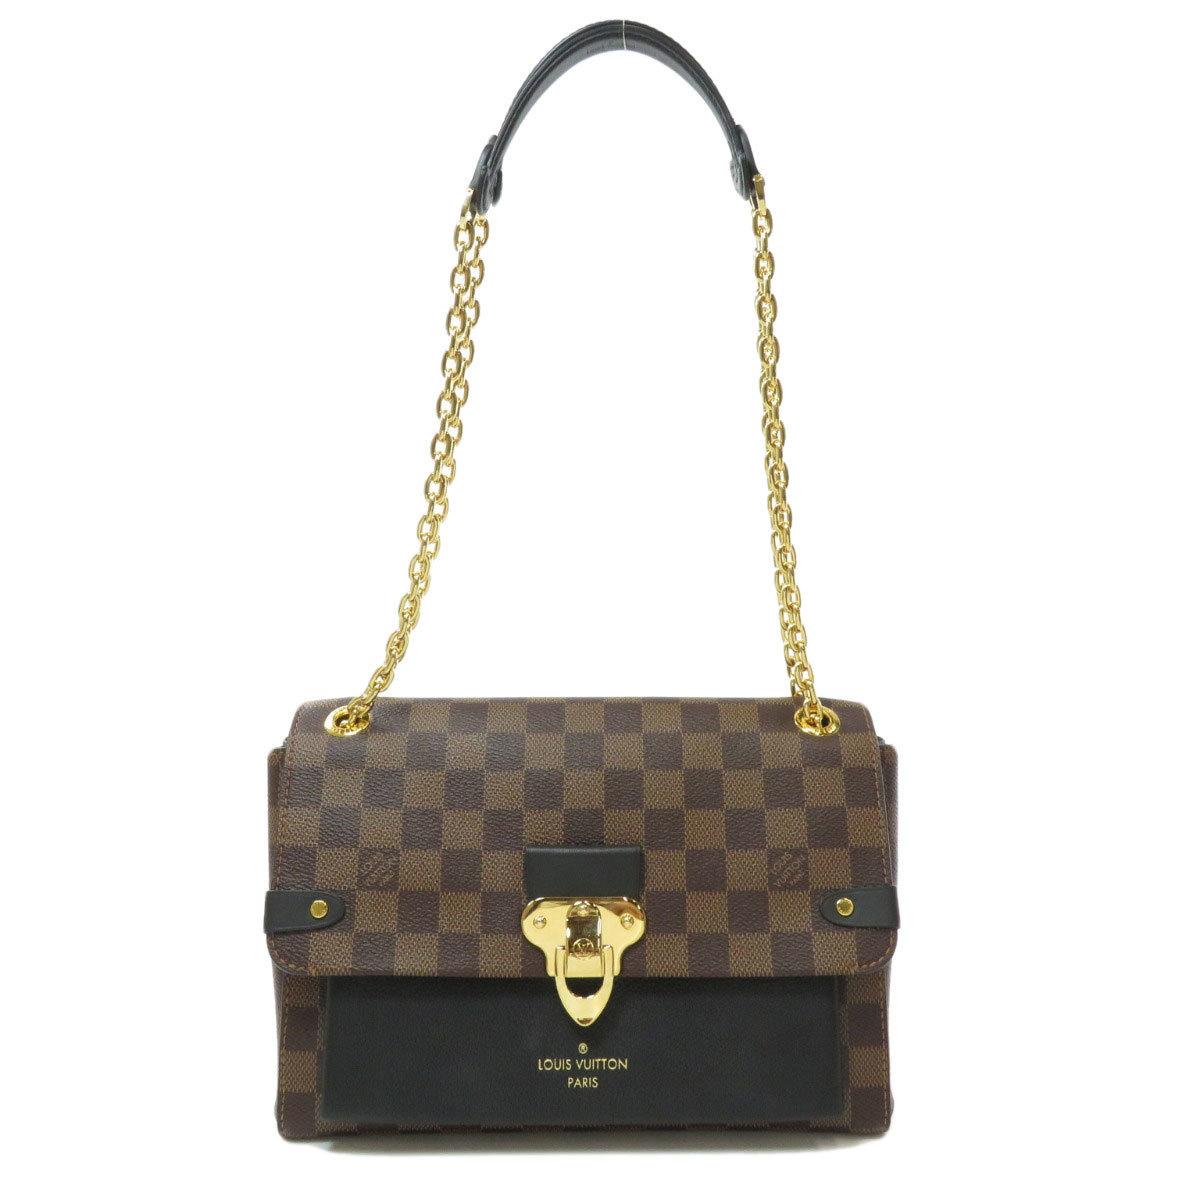 Louis Vuitton N40108 Vavan PM Damier Ebene Shoulder Bag Canvas Ladies